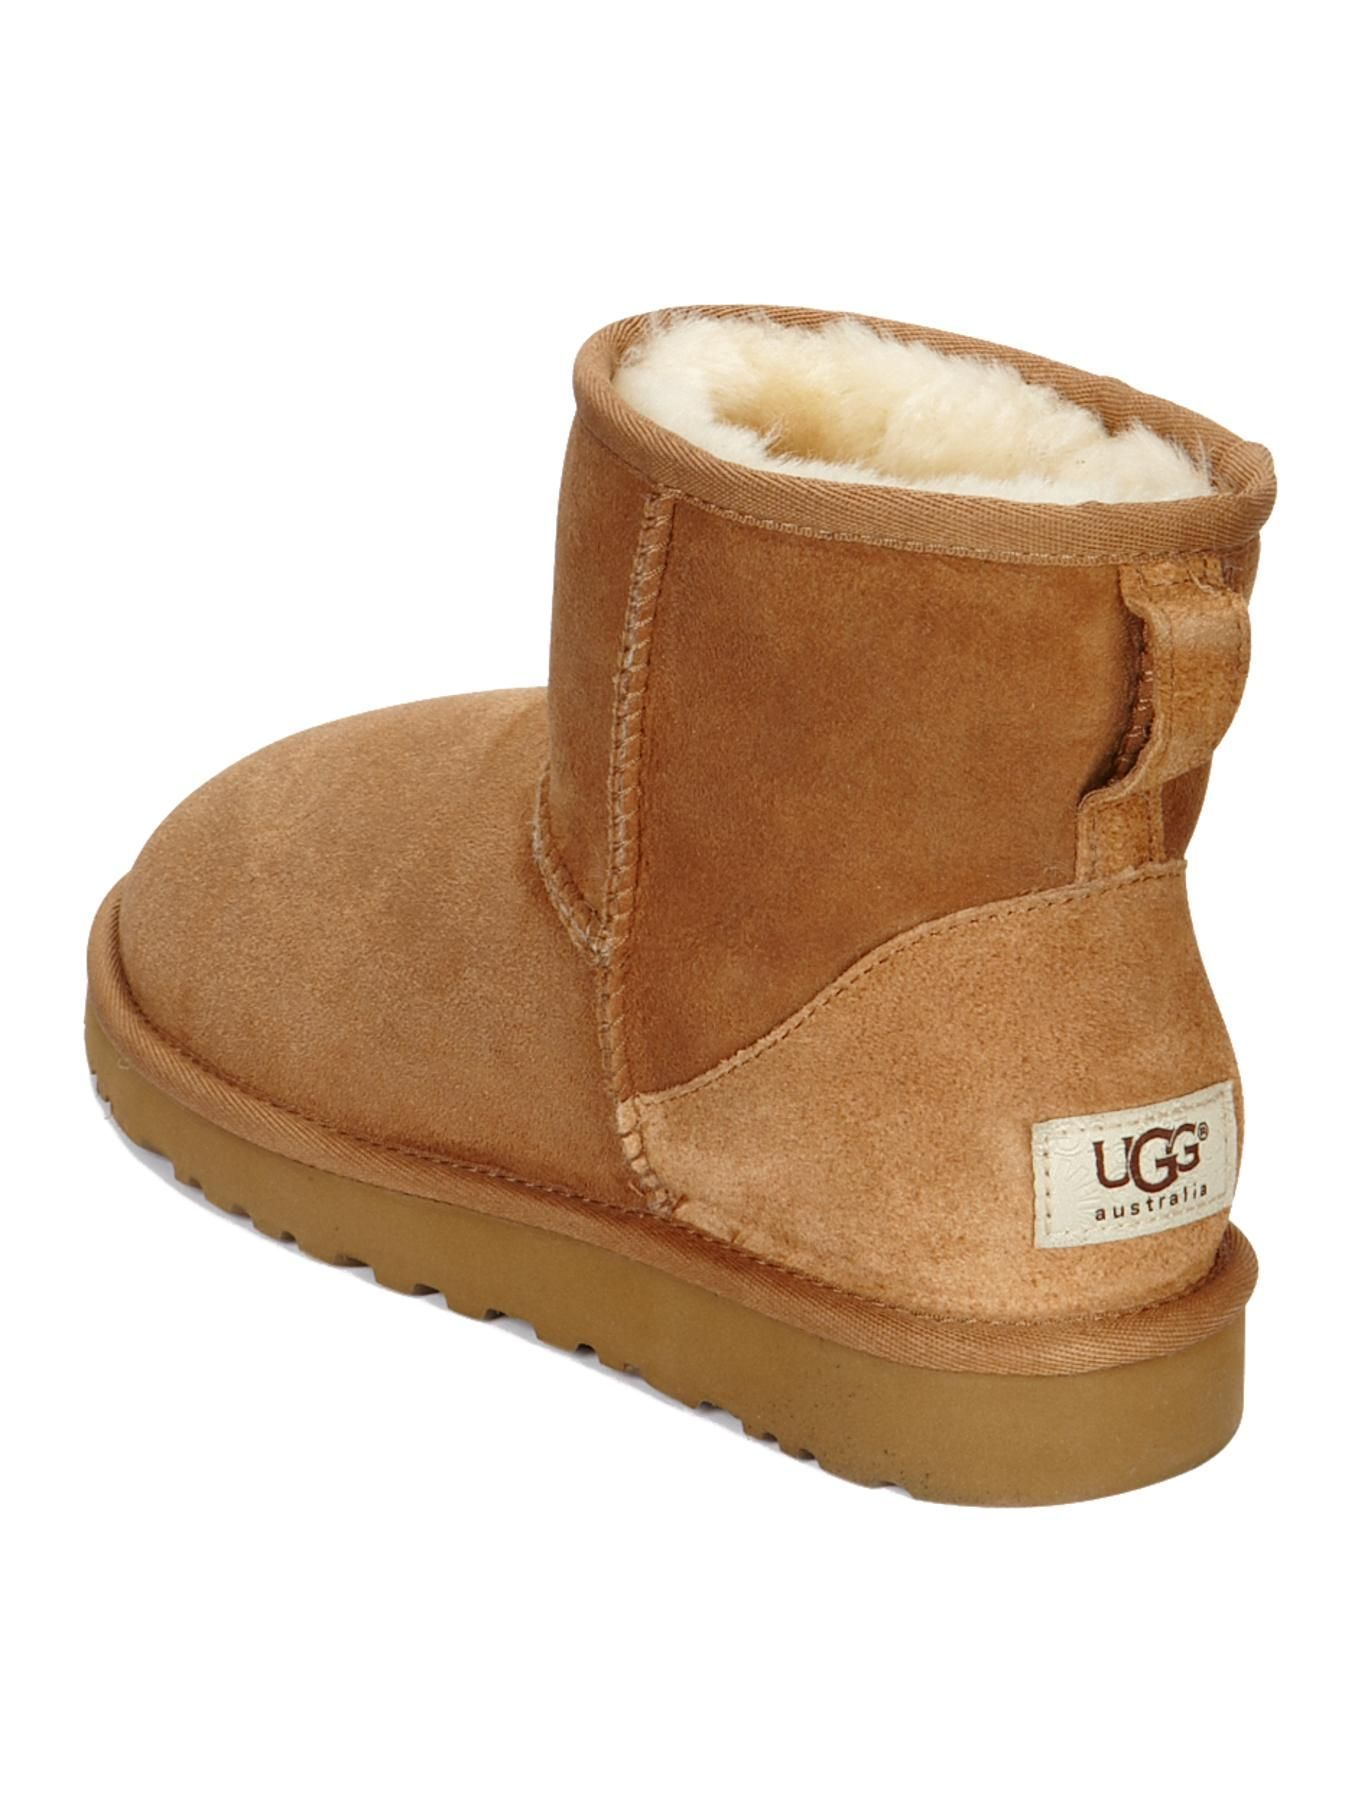 ugg classic mini ankle boots chestnut fashion designers ugg rh pinterest com